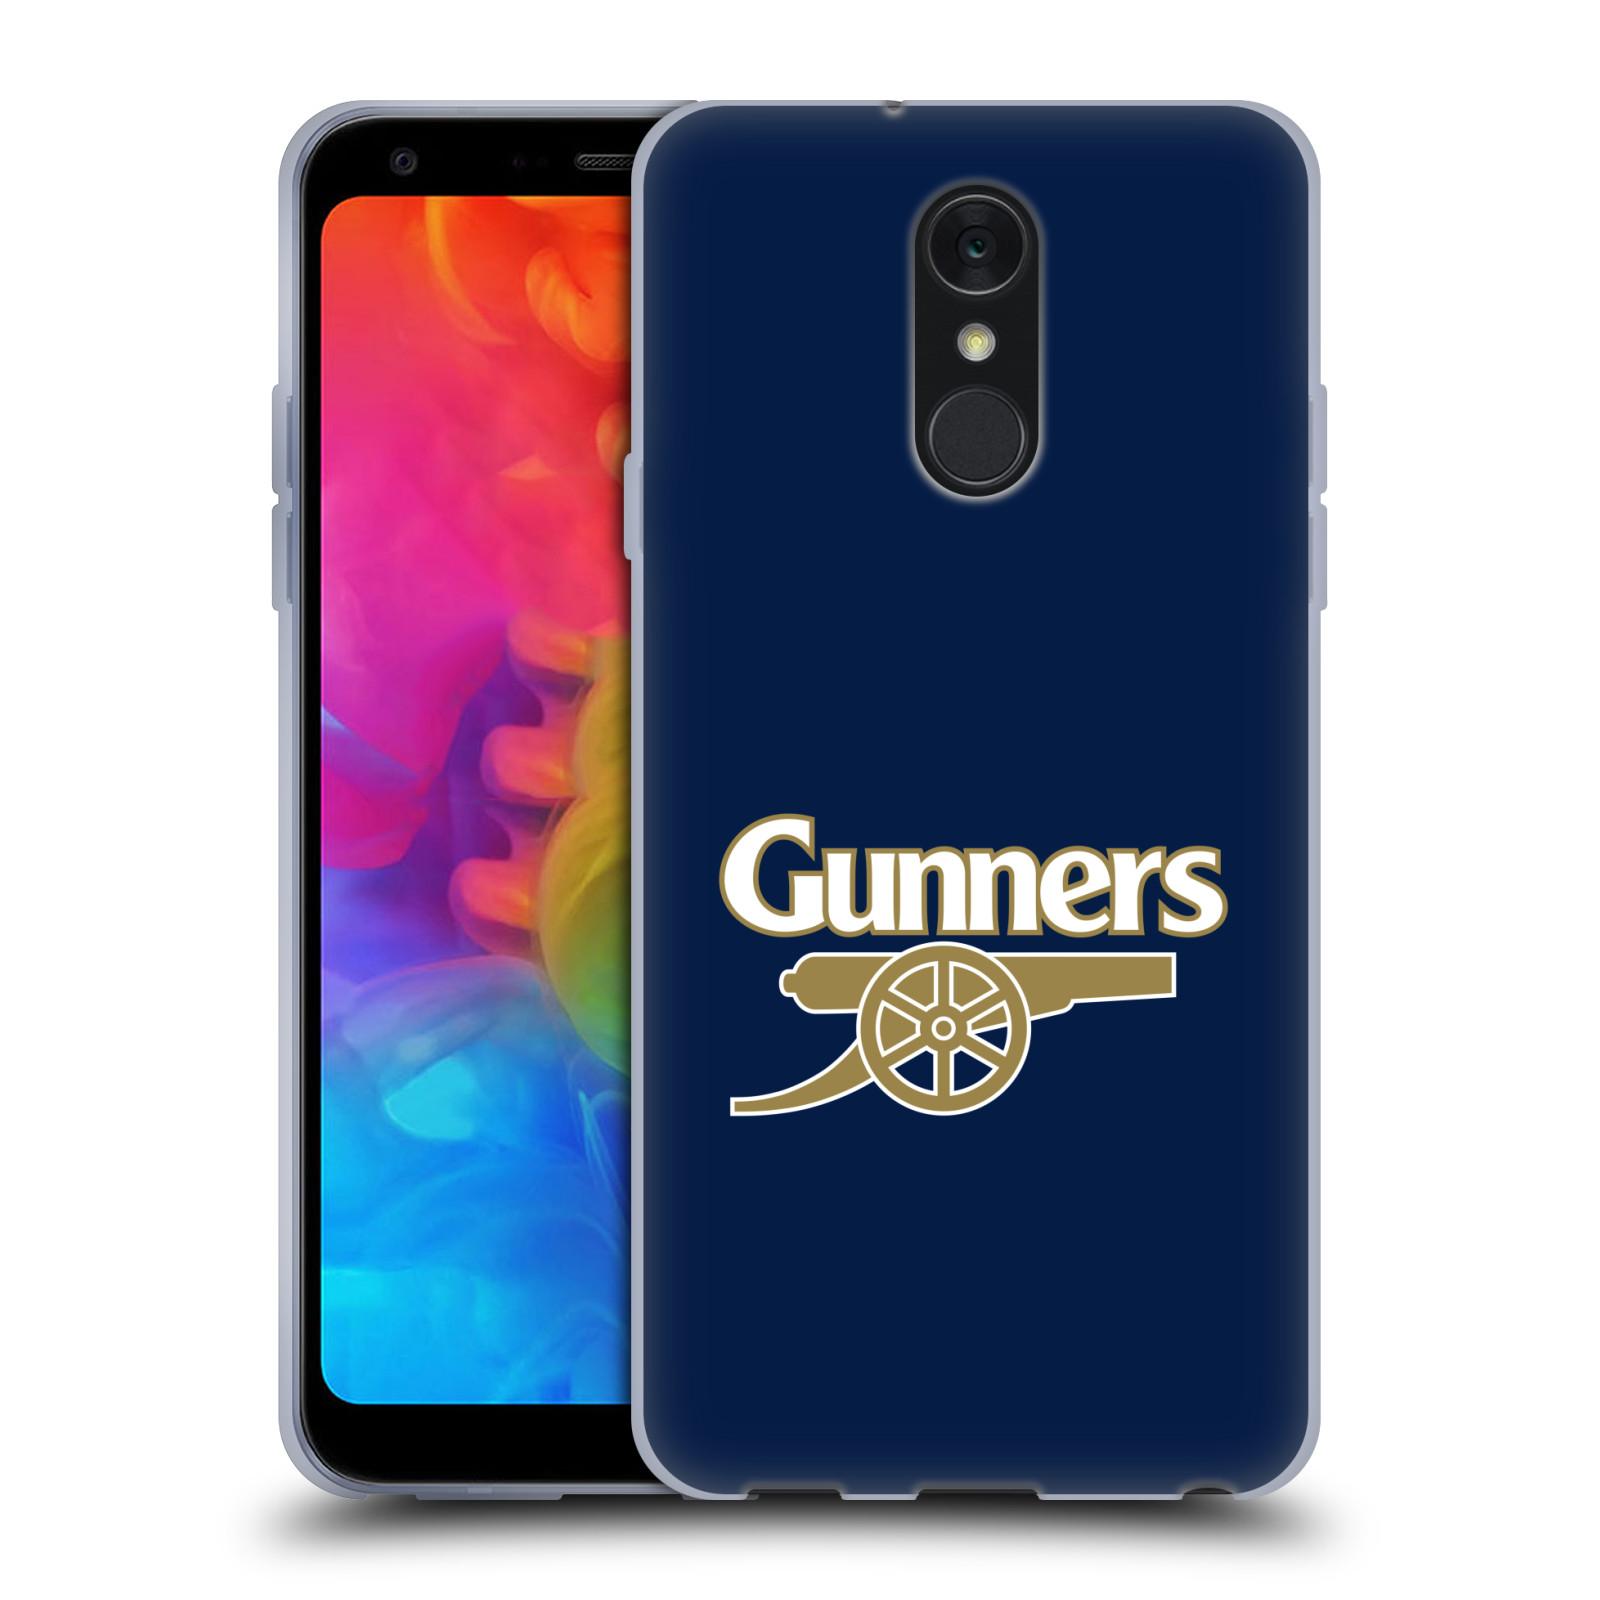 Silikonové pouzdro na mobil LG Q7 - Head Case - Arsenal FC - Gunners